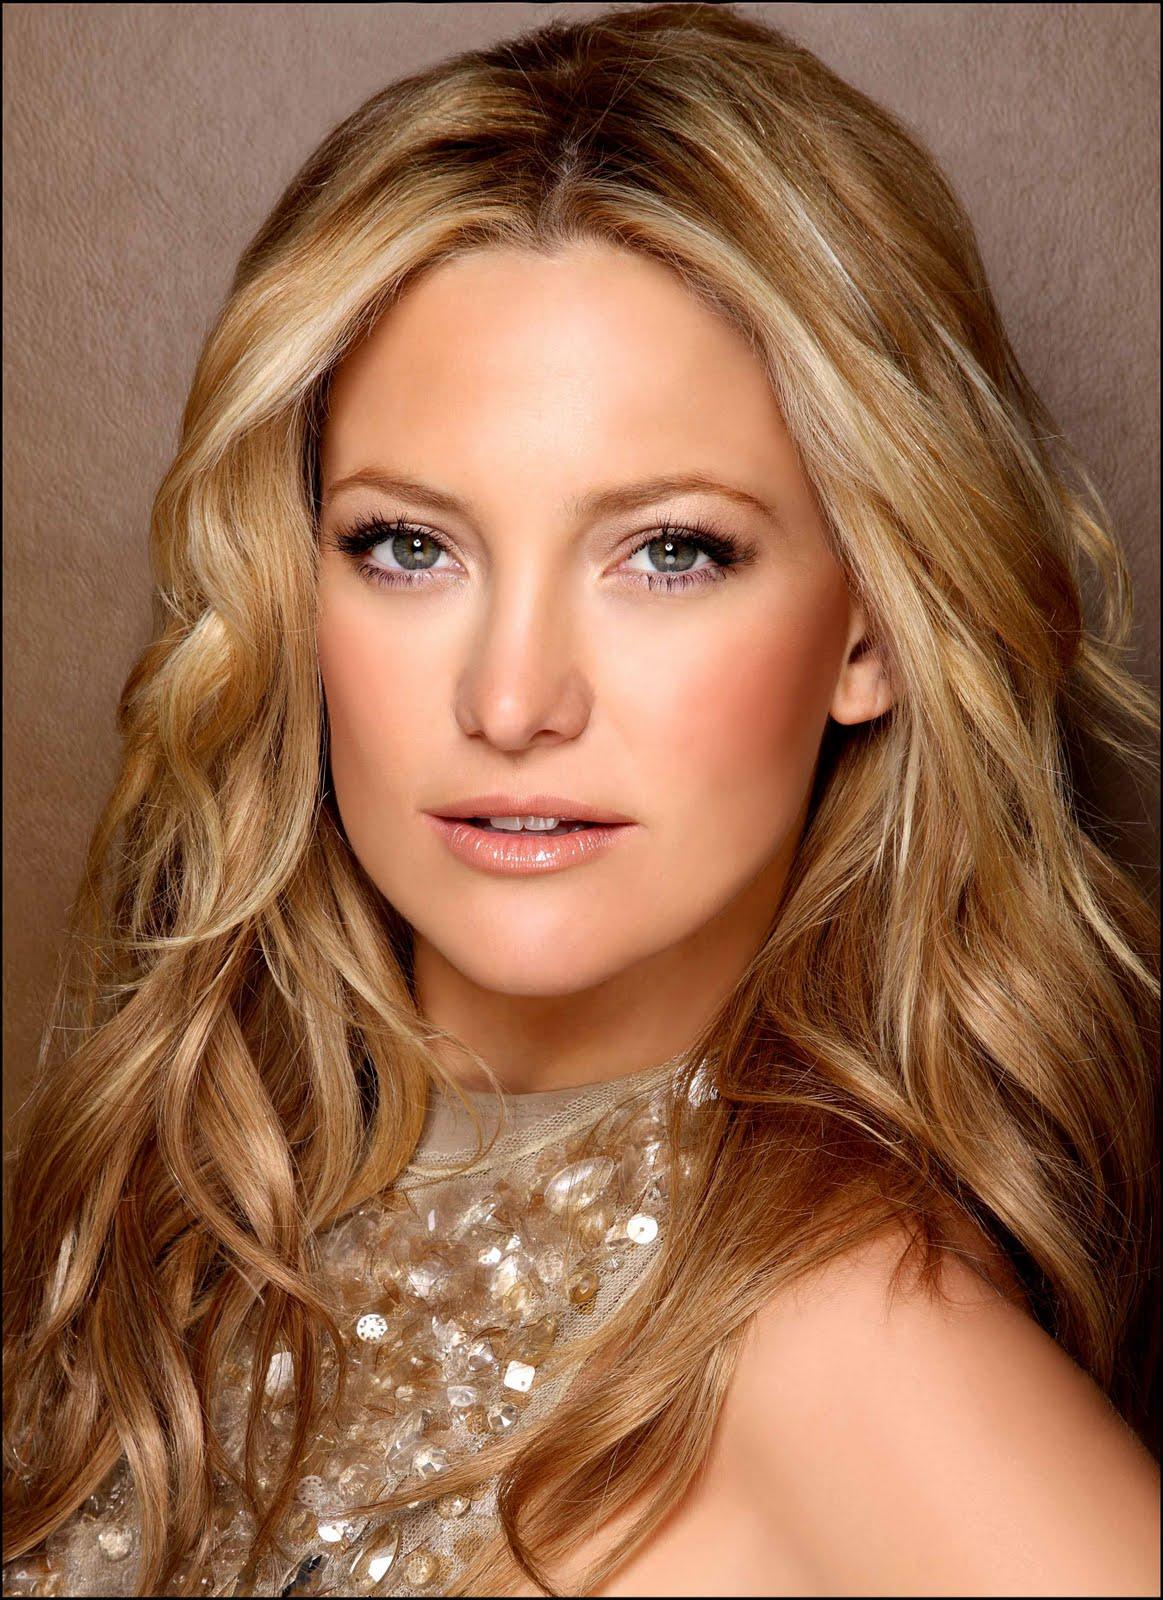 http://4.bp.blogspot.com/-0PdpqxwT6kY/UQb6d_mUOwI/AAAAAAAALuc/532_QgwMnJ8/s1600/Kate-Hudson-hairstyles-celebrity-actress-wallpaper-pictures-hudson-kate%2B%25281%2529.jpg